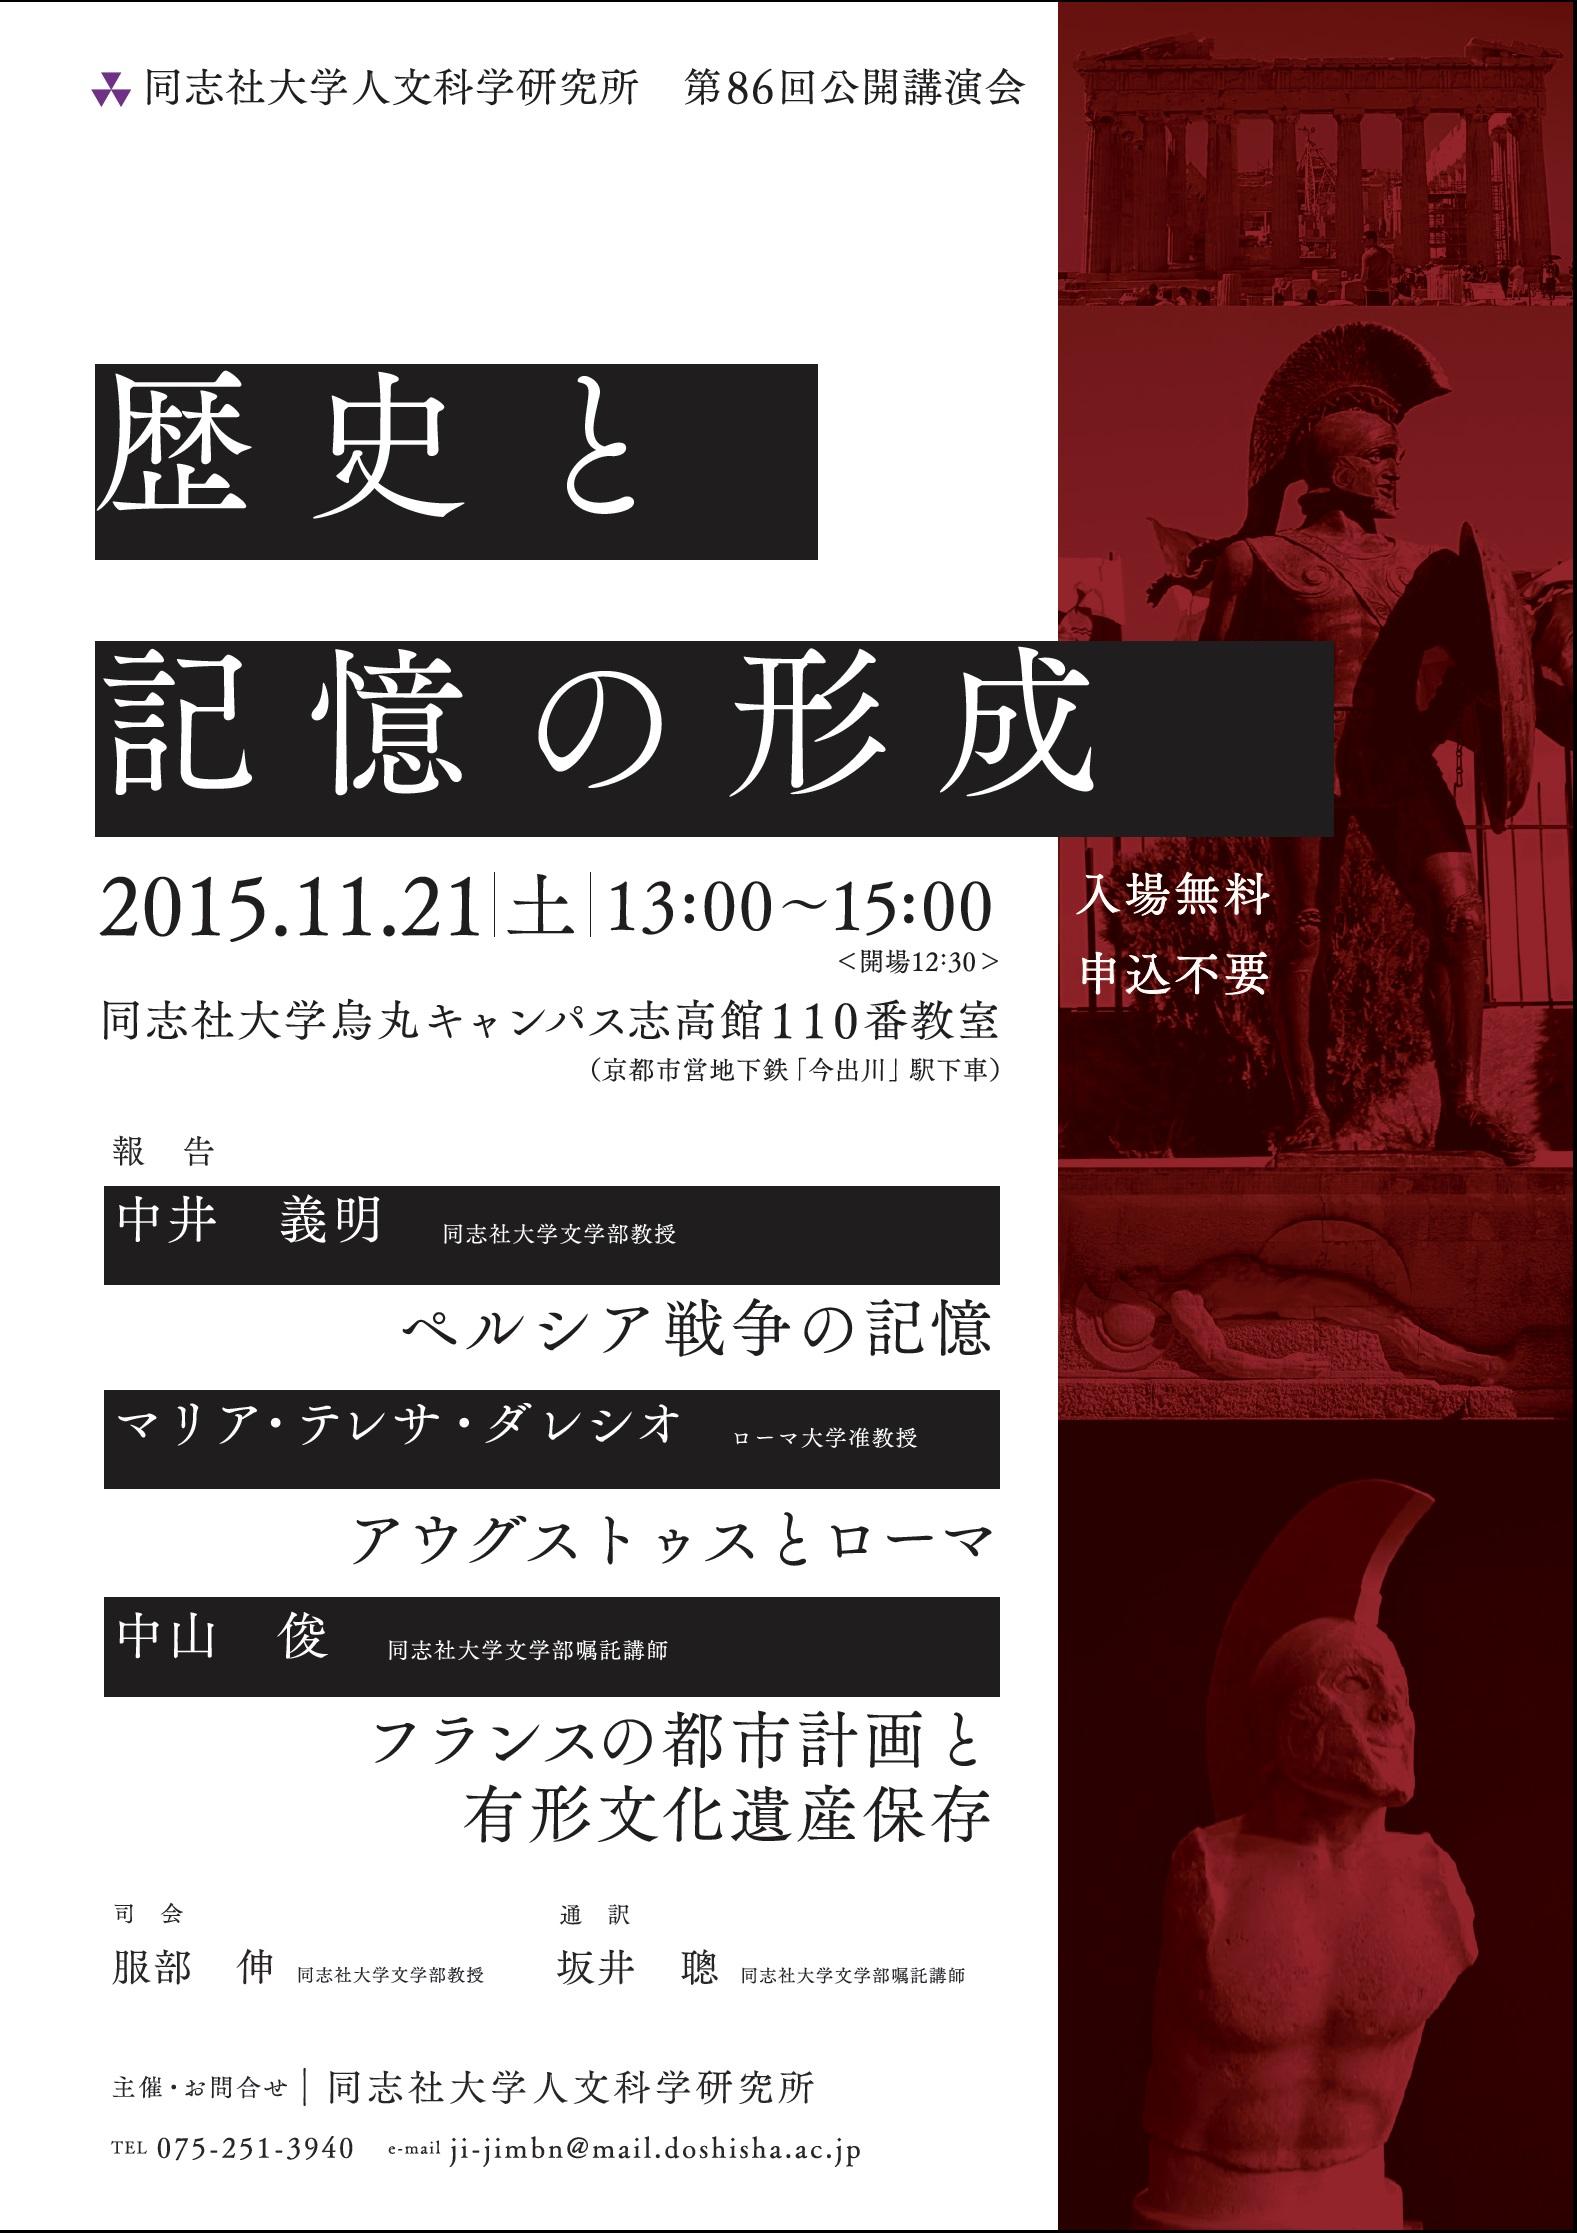 http://jinbun.doshisha.ac.jp/attach/news/JINBUN-NEWS-JA-37/62454/original-file/2015.11.21.jpg